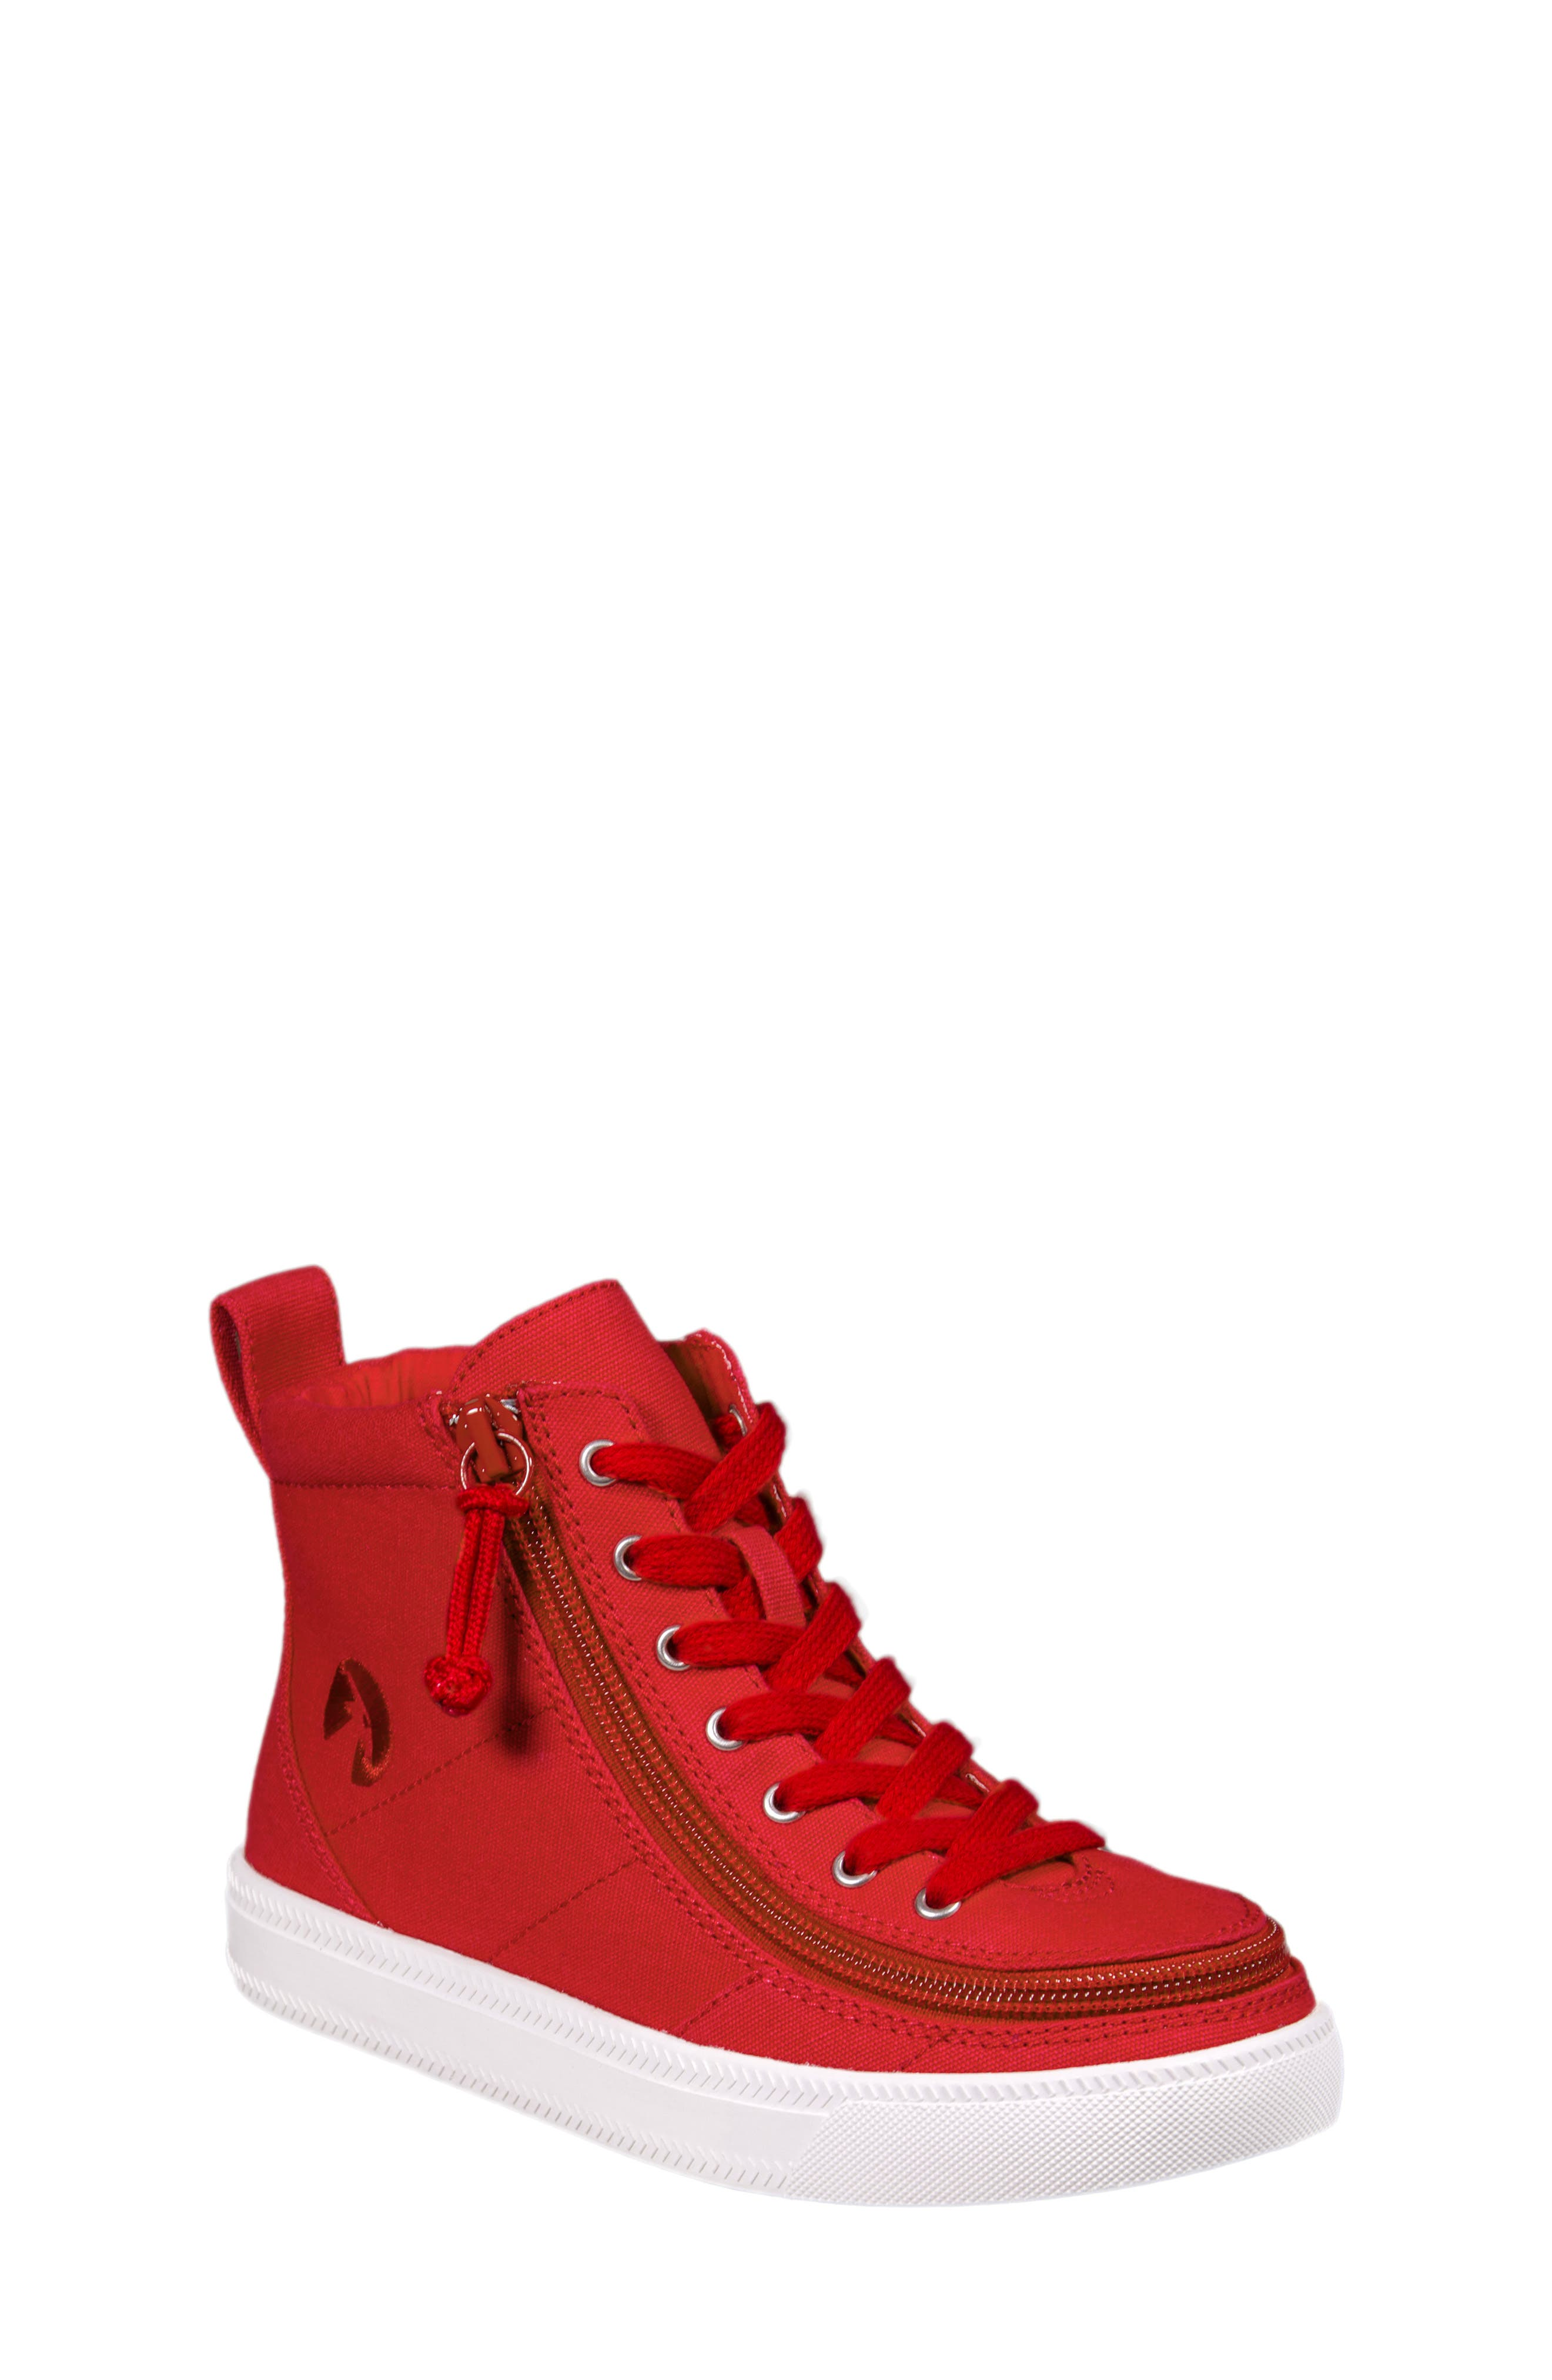 Main Image - BILLY Footwear Zip Around High Top Sneaker (Toddler, Little Kid & Big Kid)